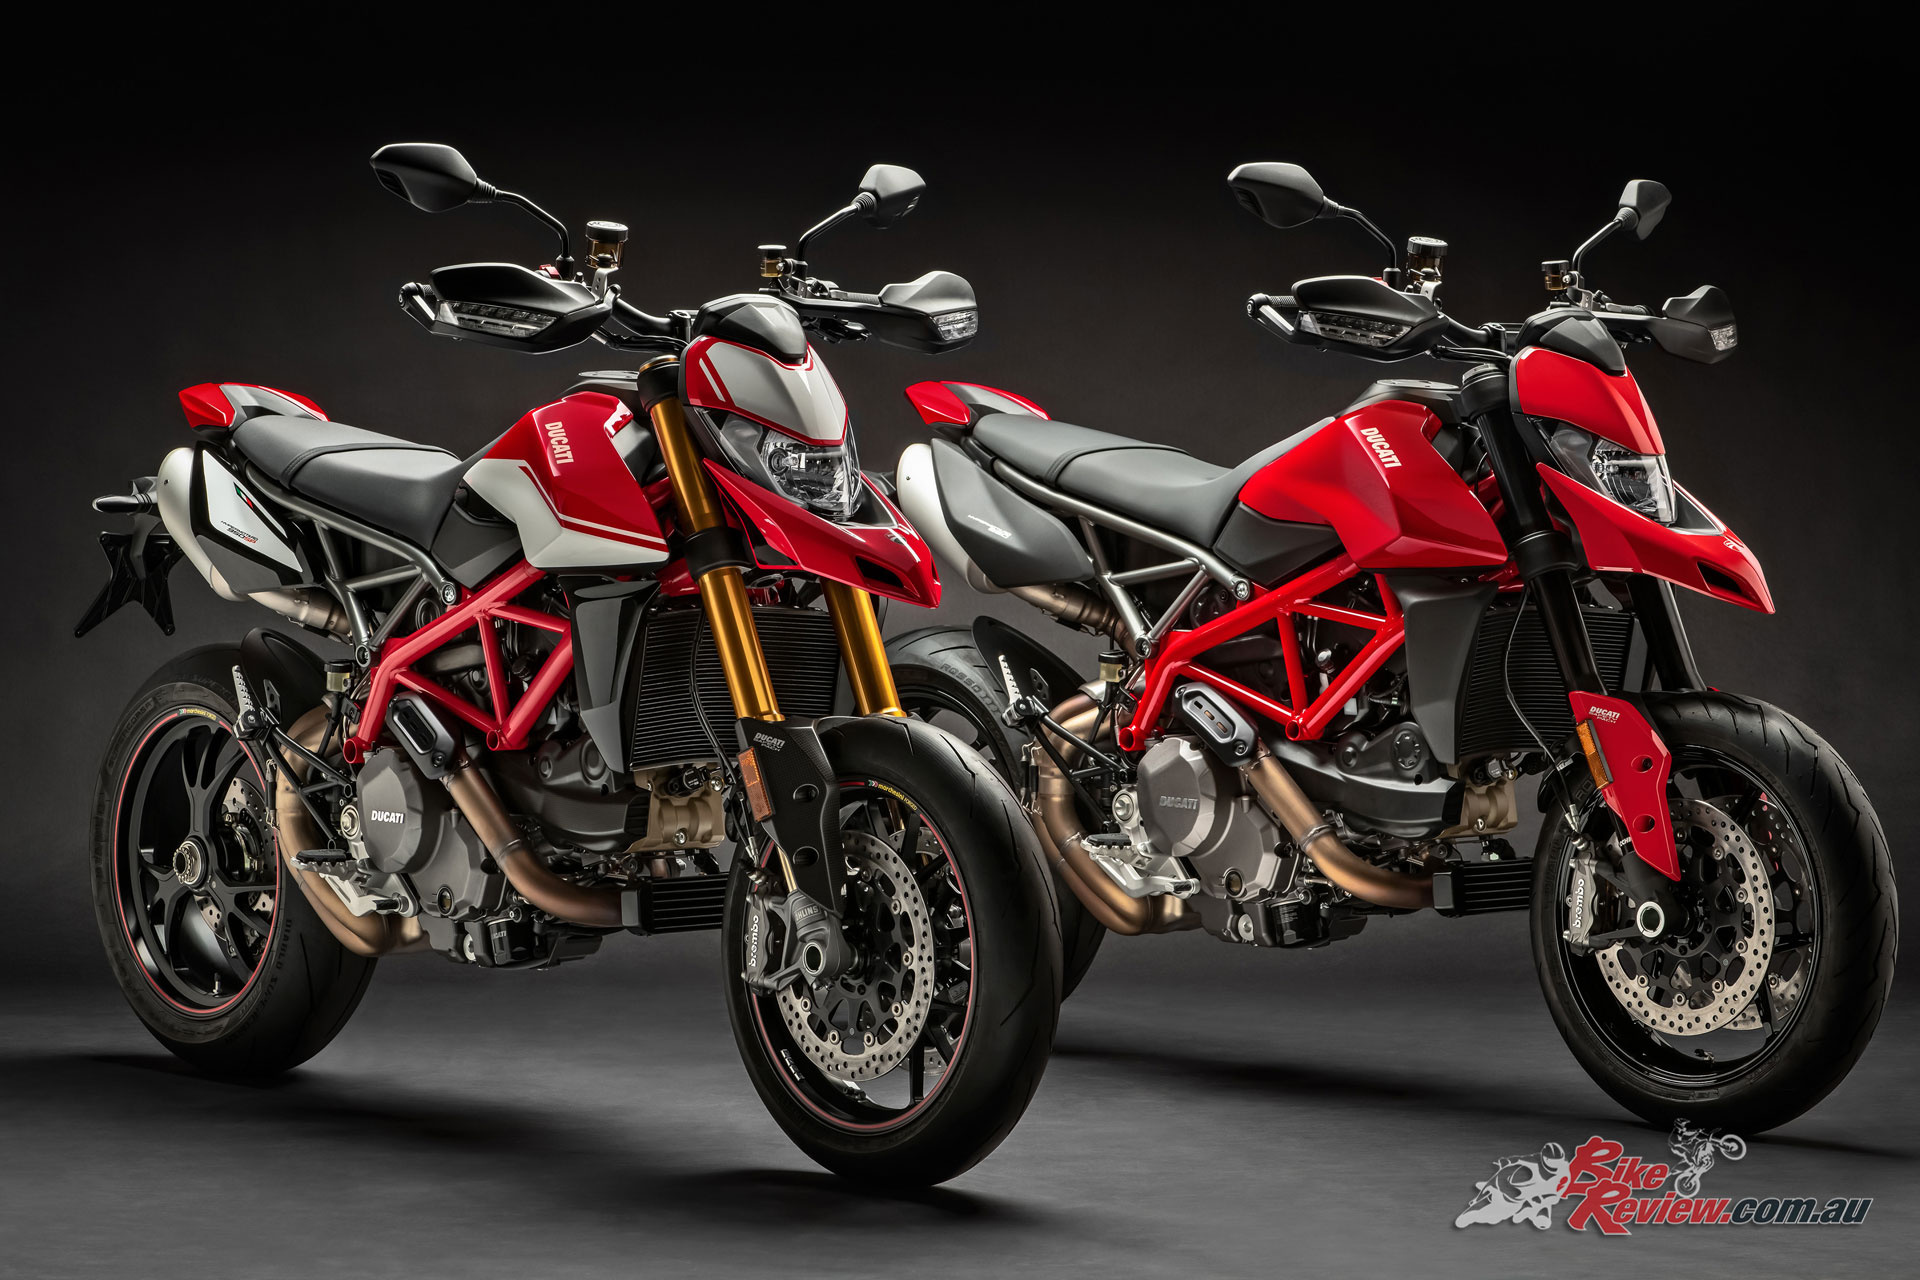 2019 Ducati Hypermotard 950 SP & Hypermotard 950